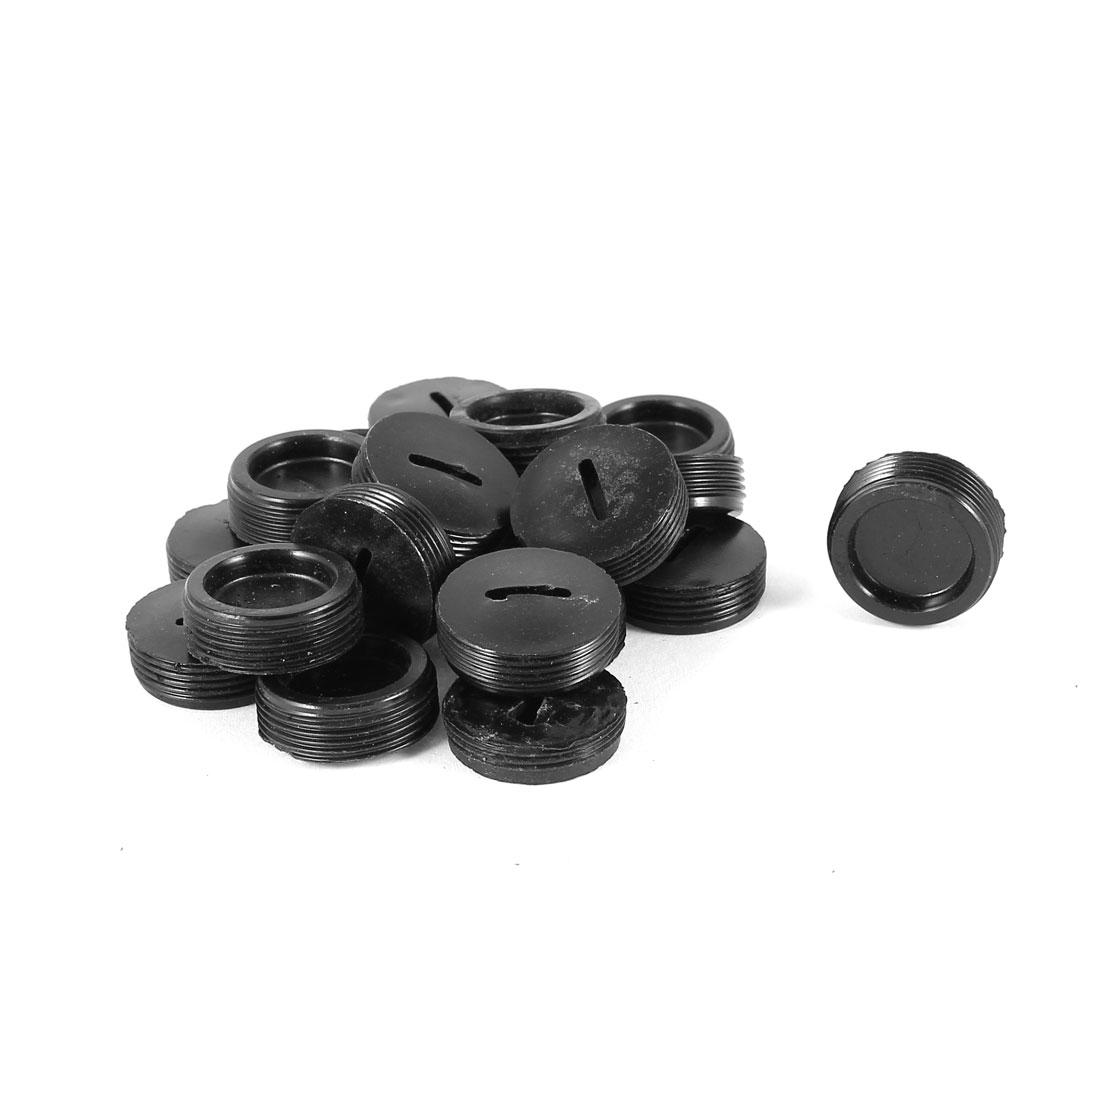 20 Pcs 7mm High 19.5mm Dia External Thread Round Black Plastic Motor Carbon Brush Holder Cap Cover